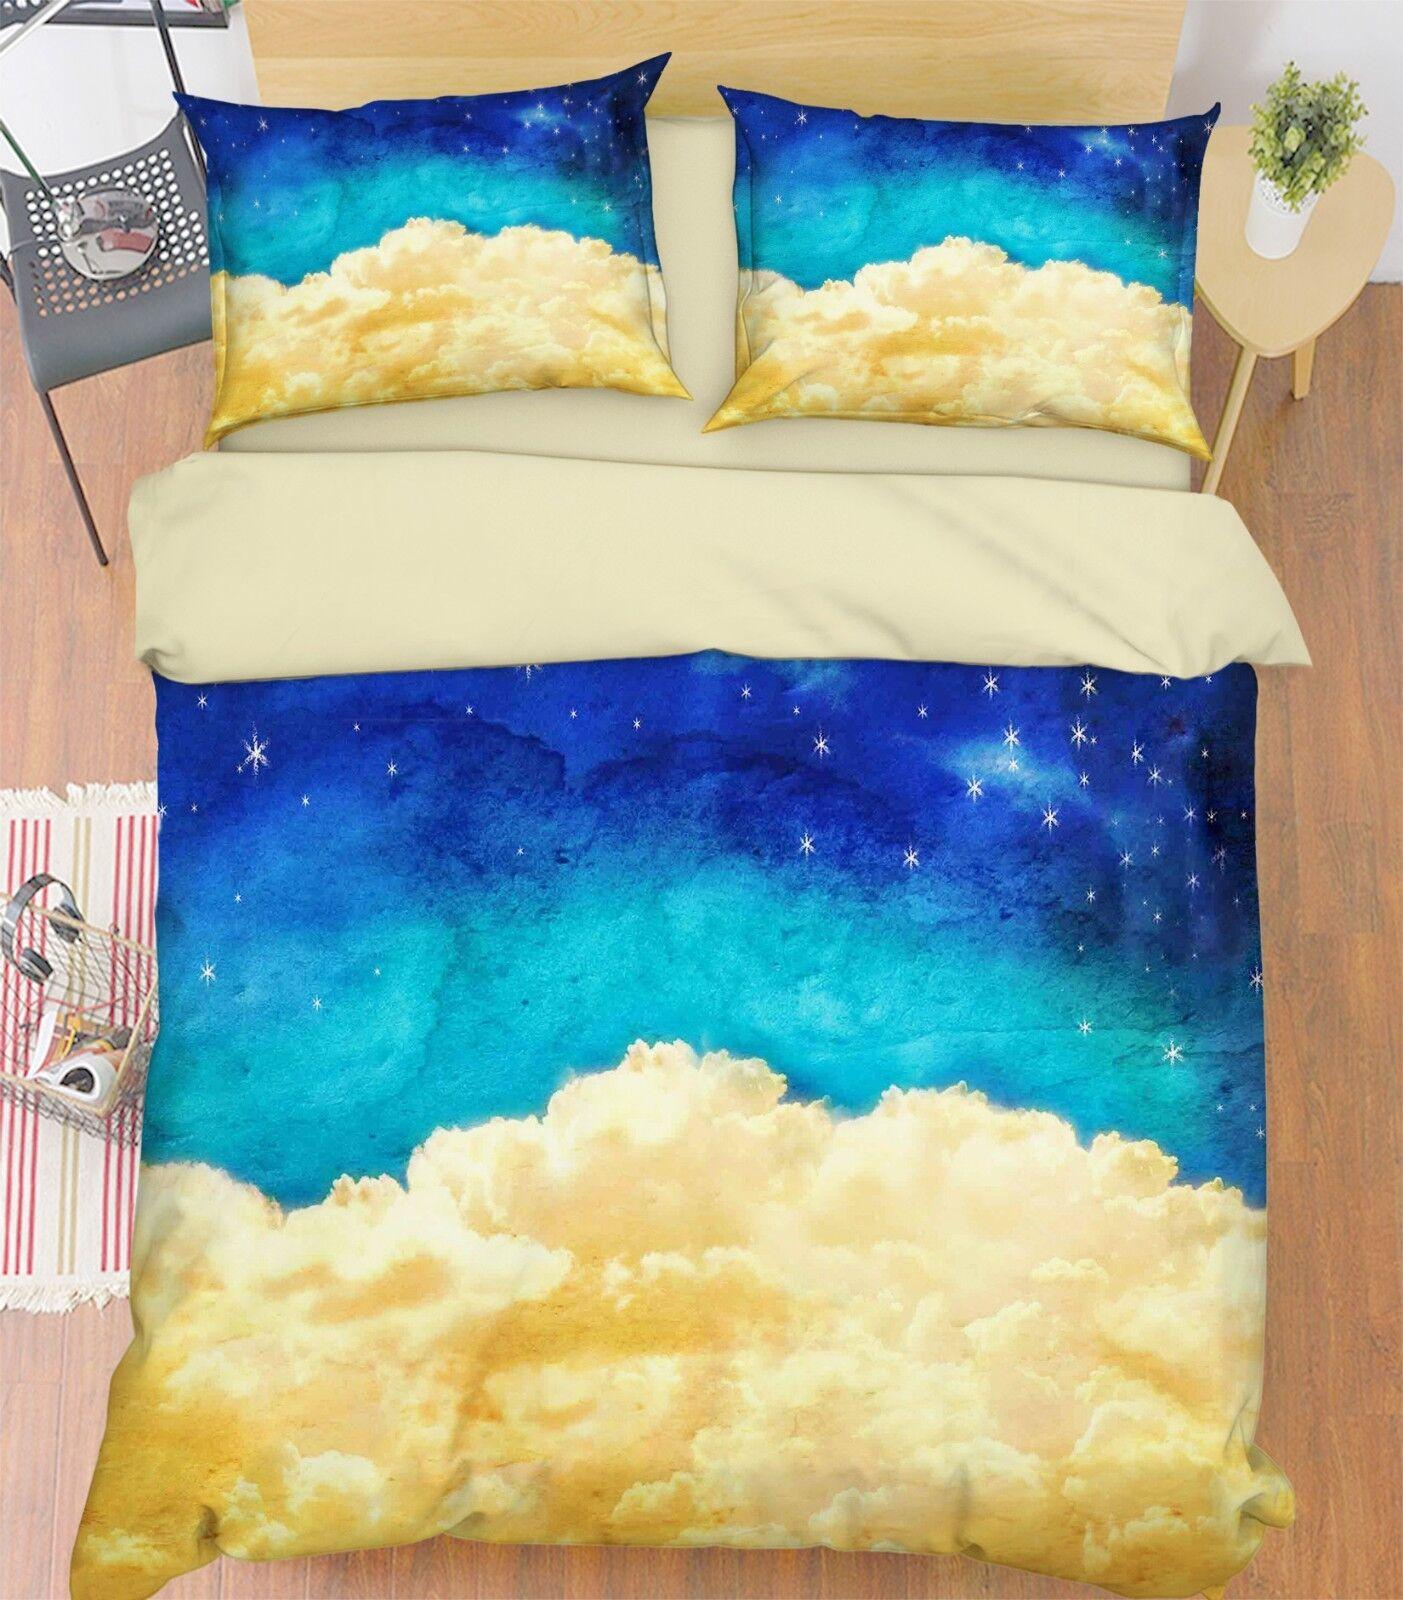 3D Cloud Star 64 Bed Pillowcases Quilt Duvet Cover Set Single Queen King AU Cobb